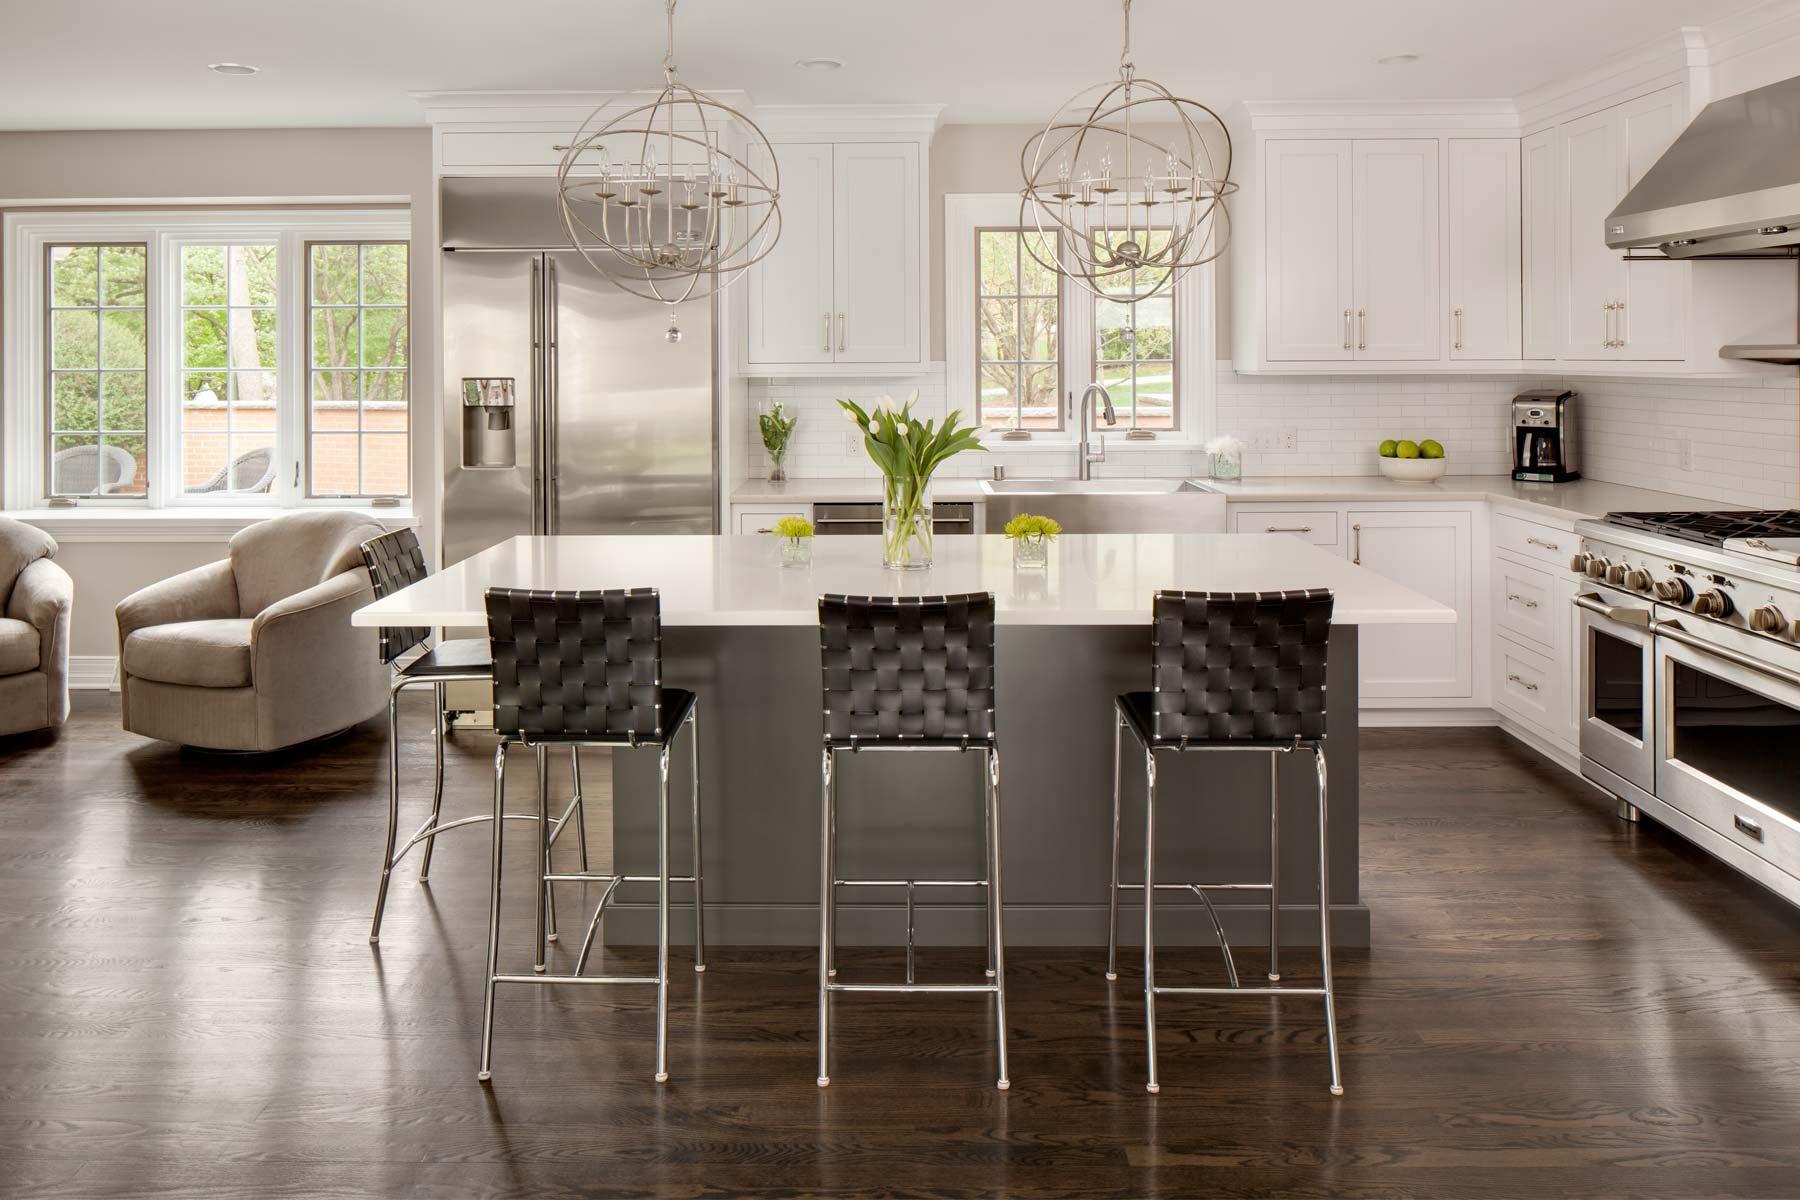 sazama home remodeling, improvement & additions - milwaukee